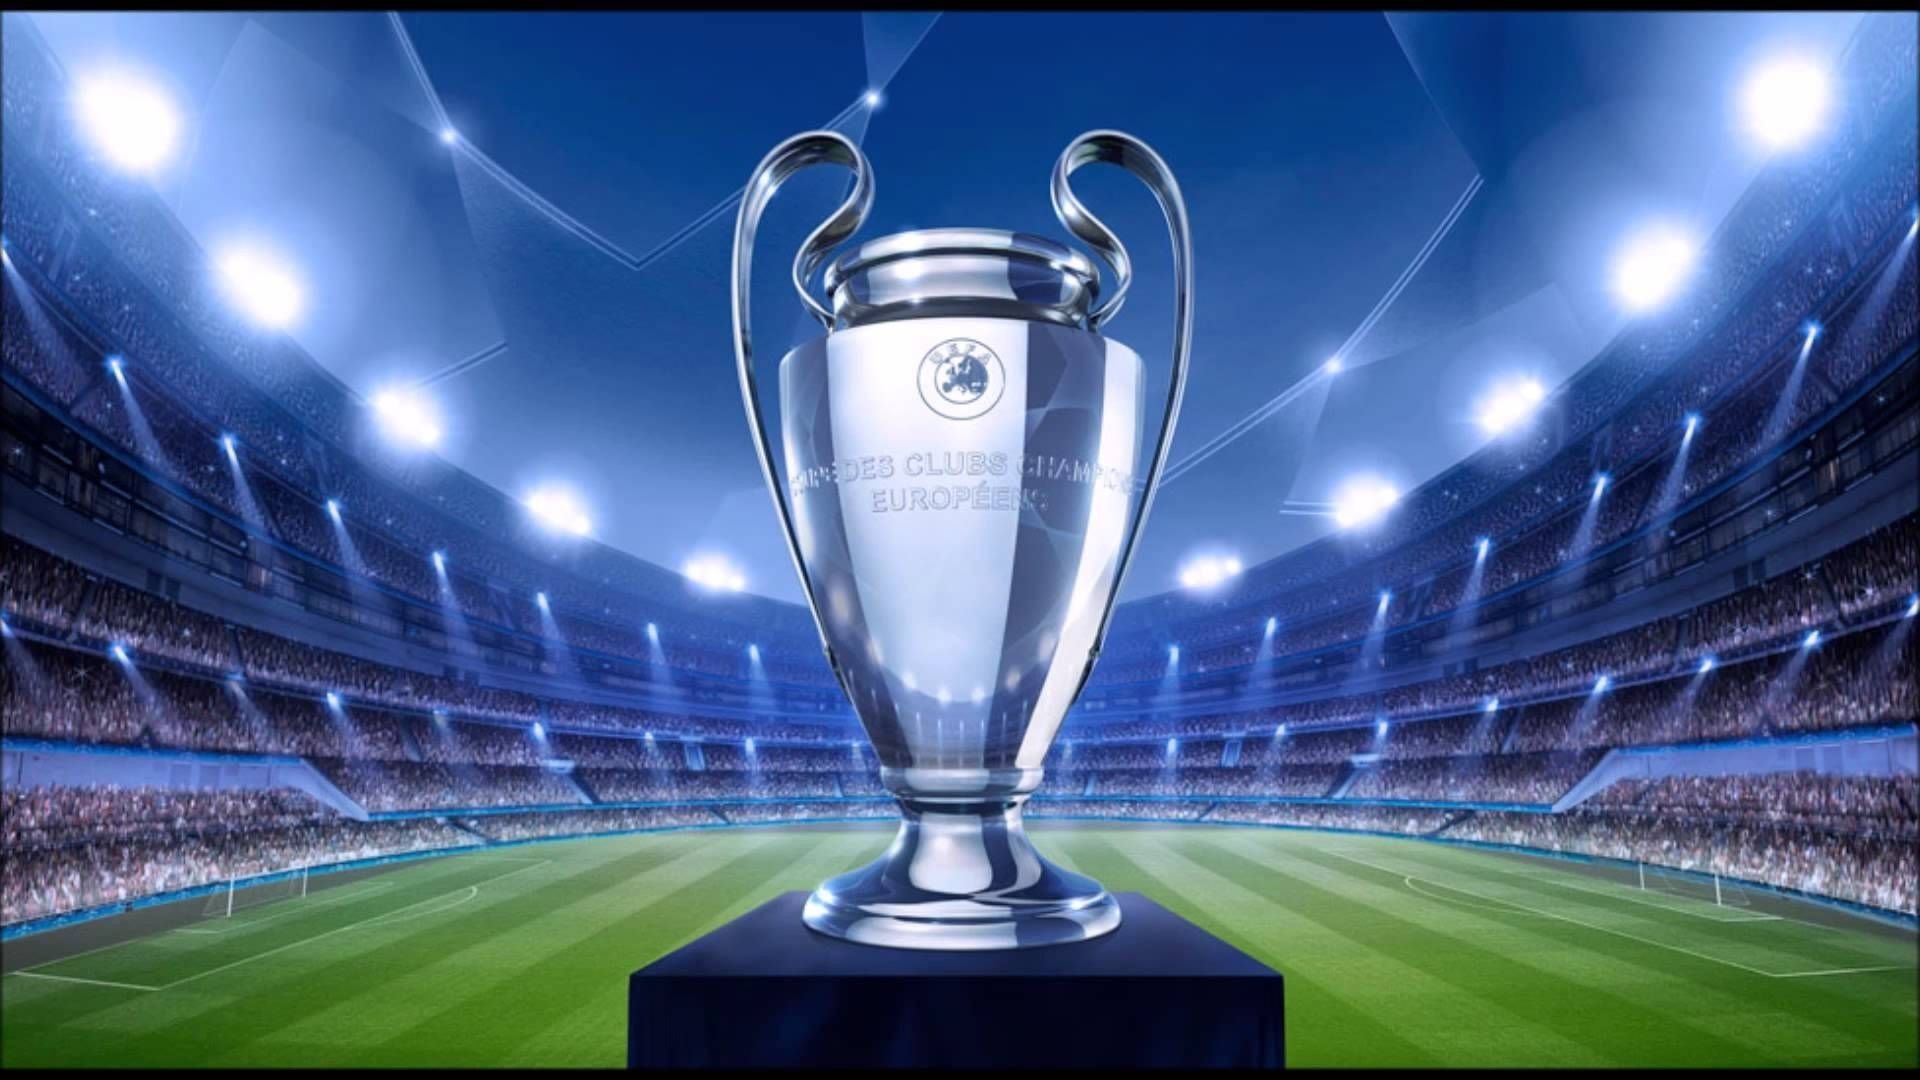 Pin by Rturth Jimmy on neymar psg Champions league, Uefa